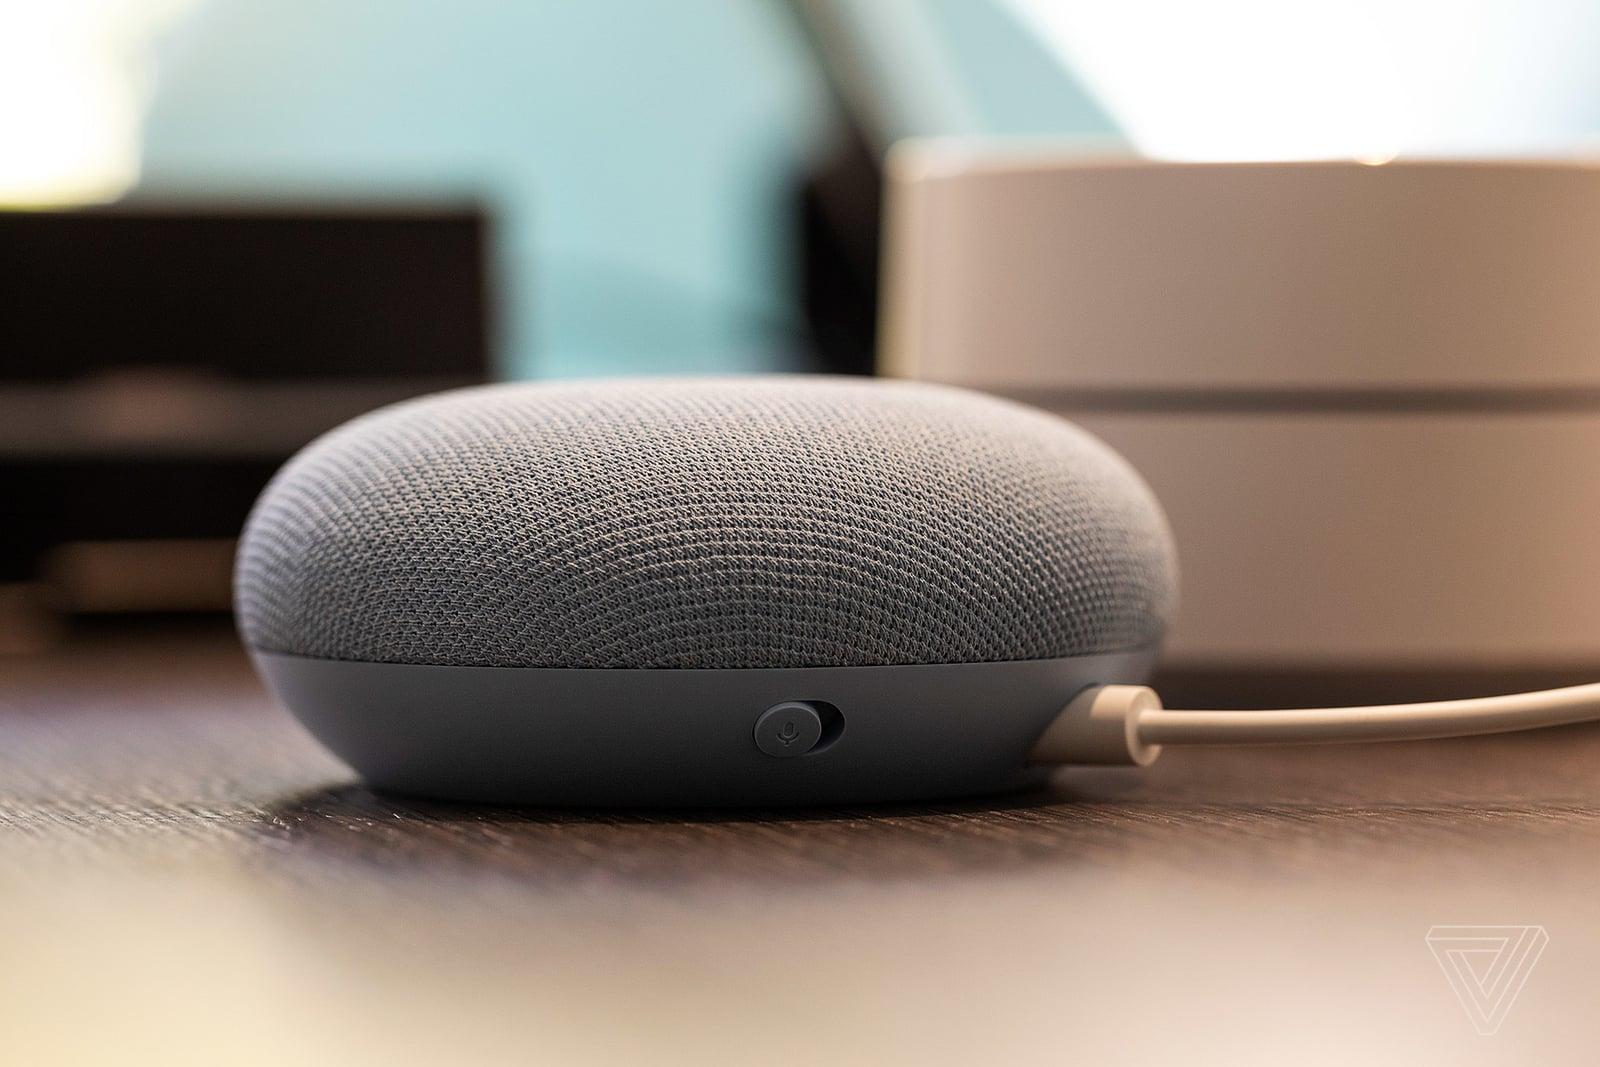 Google giới thiệu loa thông minh Nest Mini mới